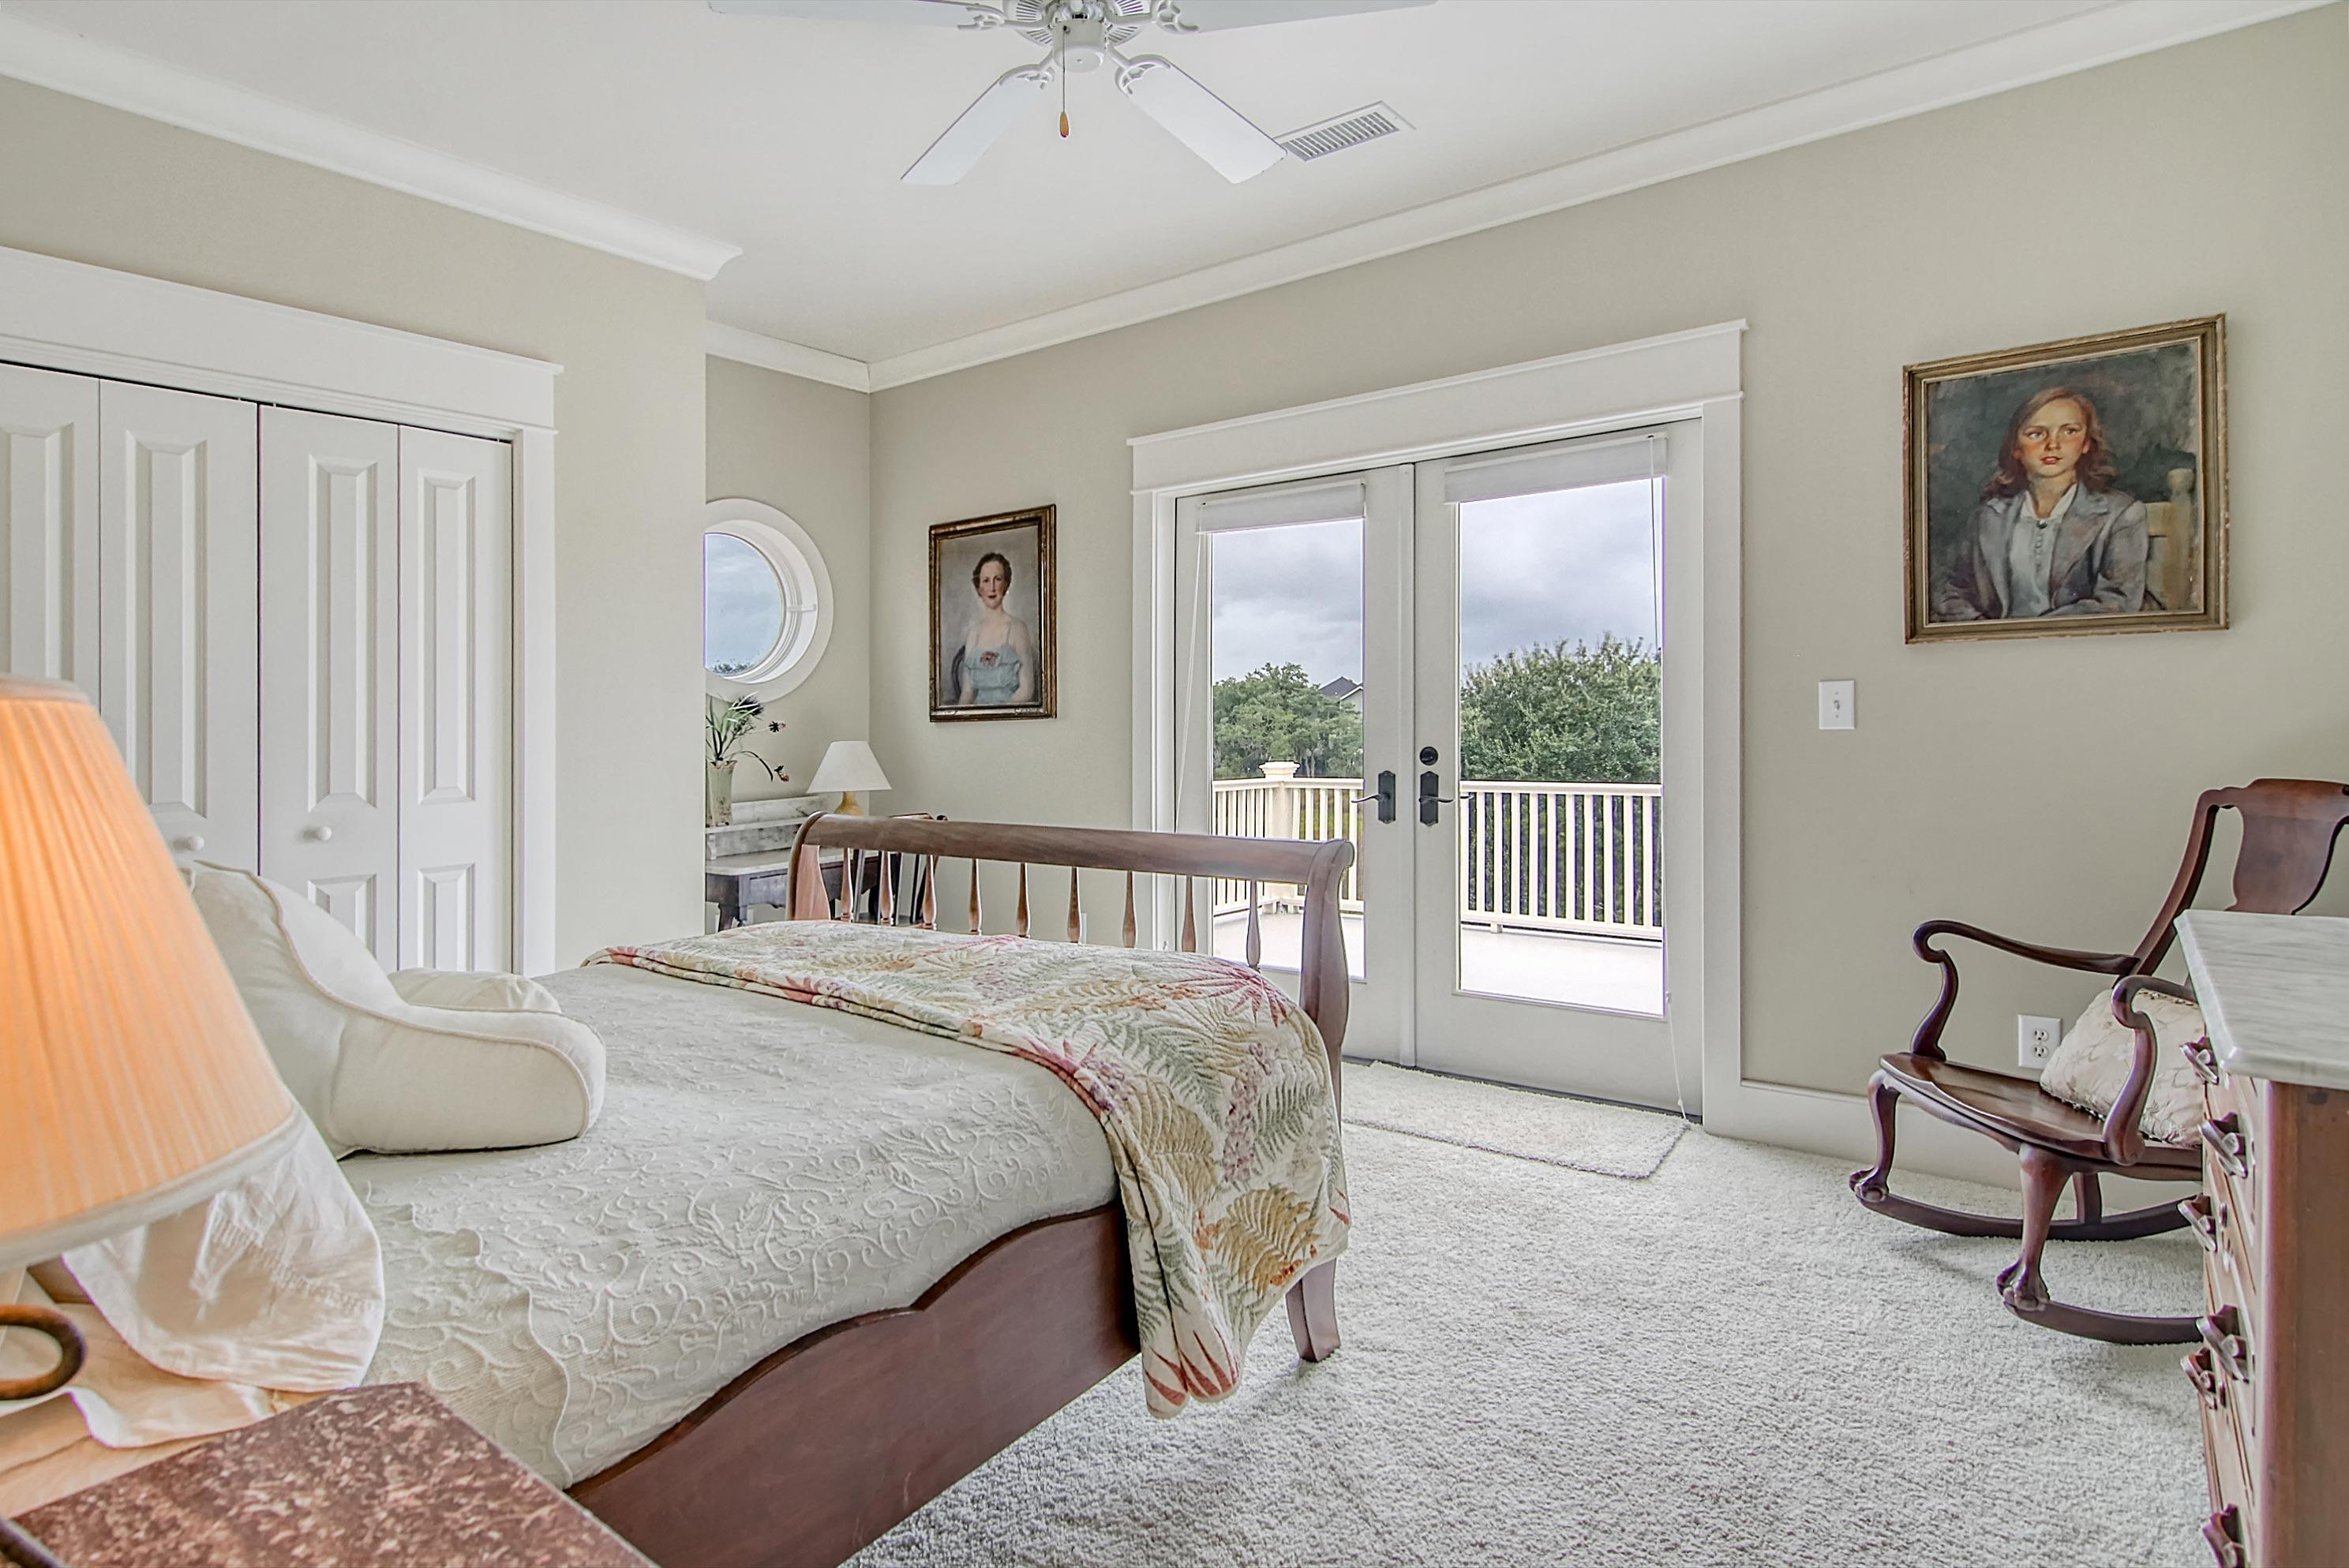 Scanlonville Homes For Sale - 152 6th, Mount Pleasant, SC - 77